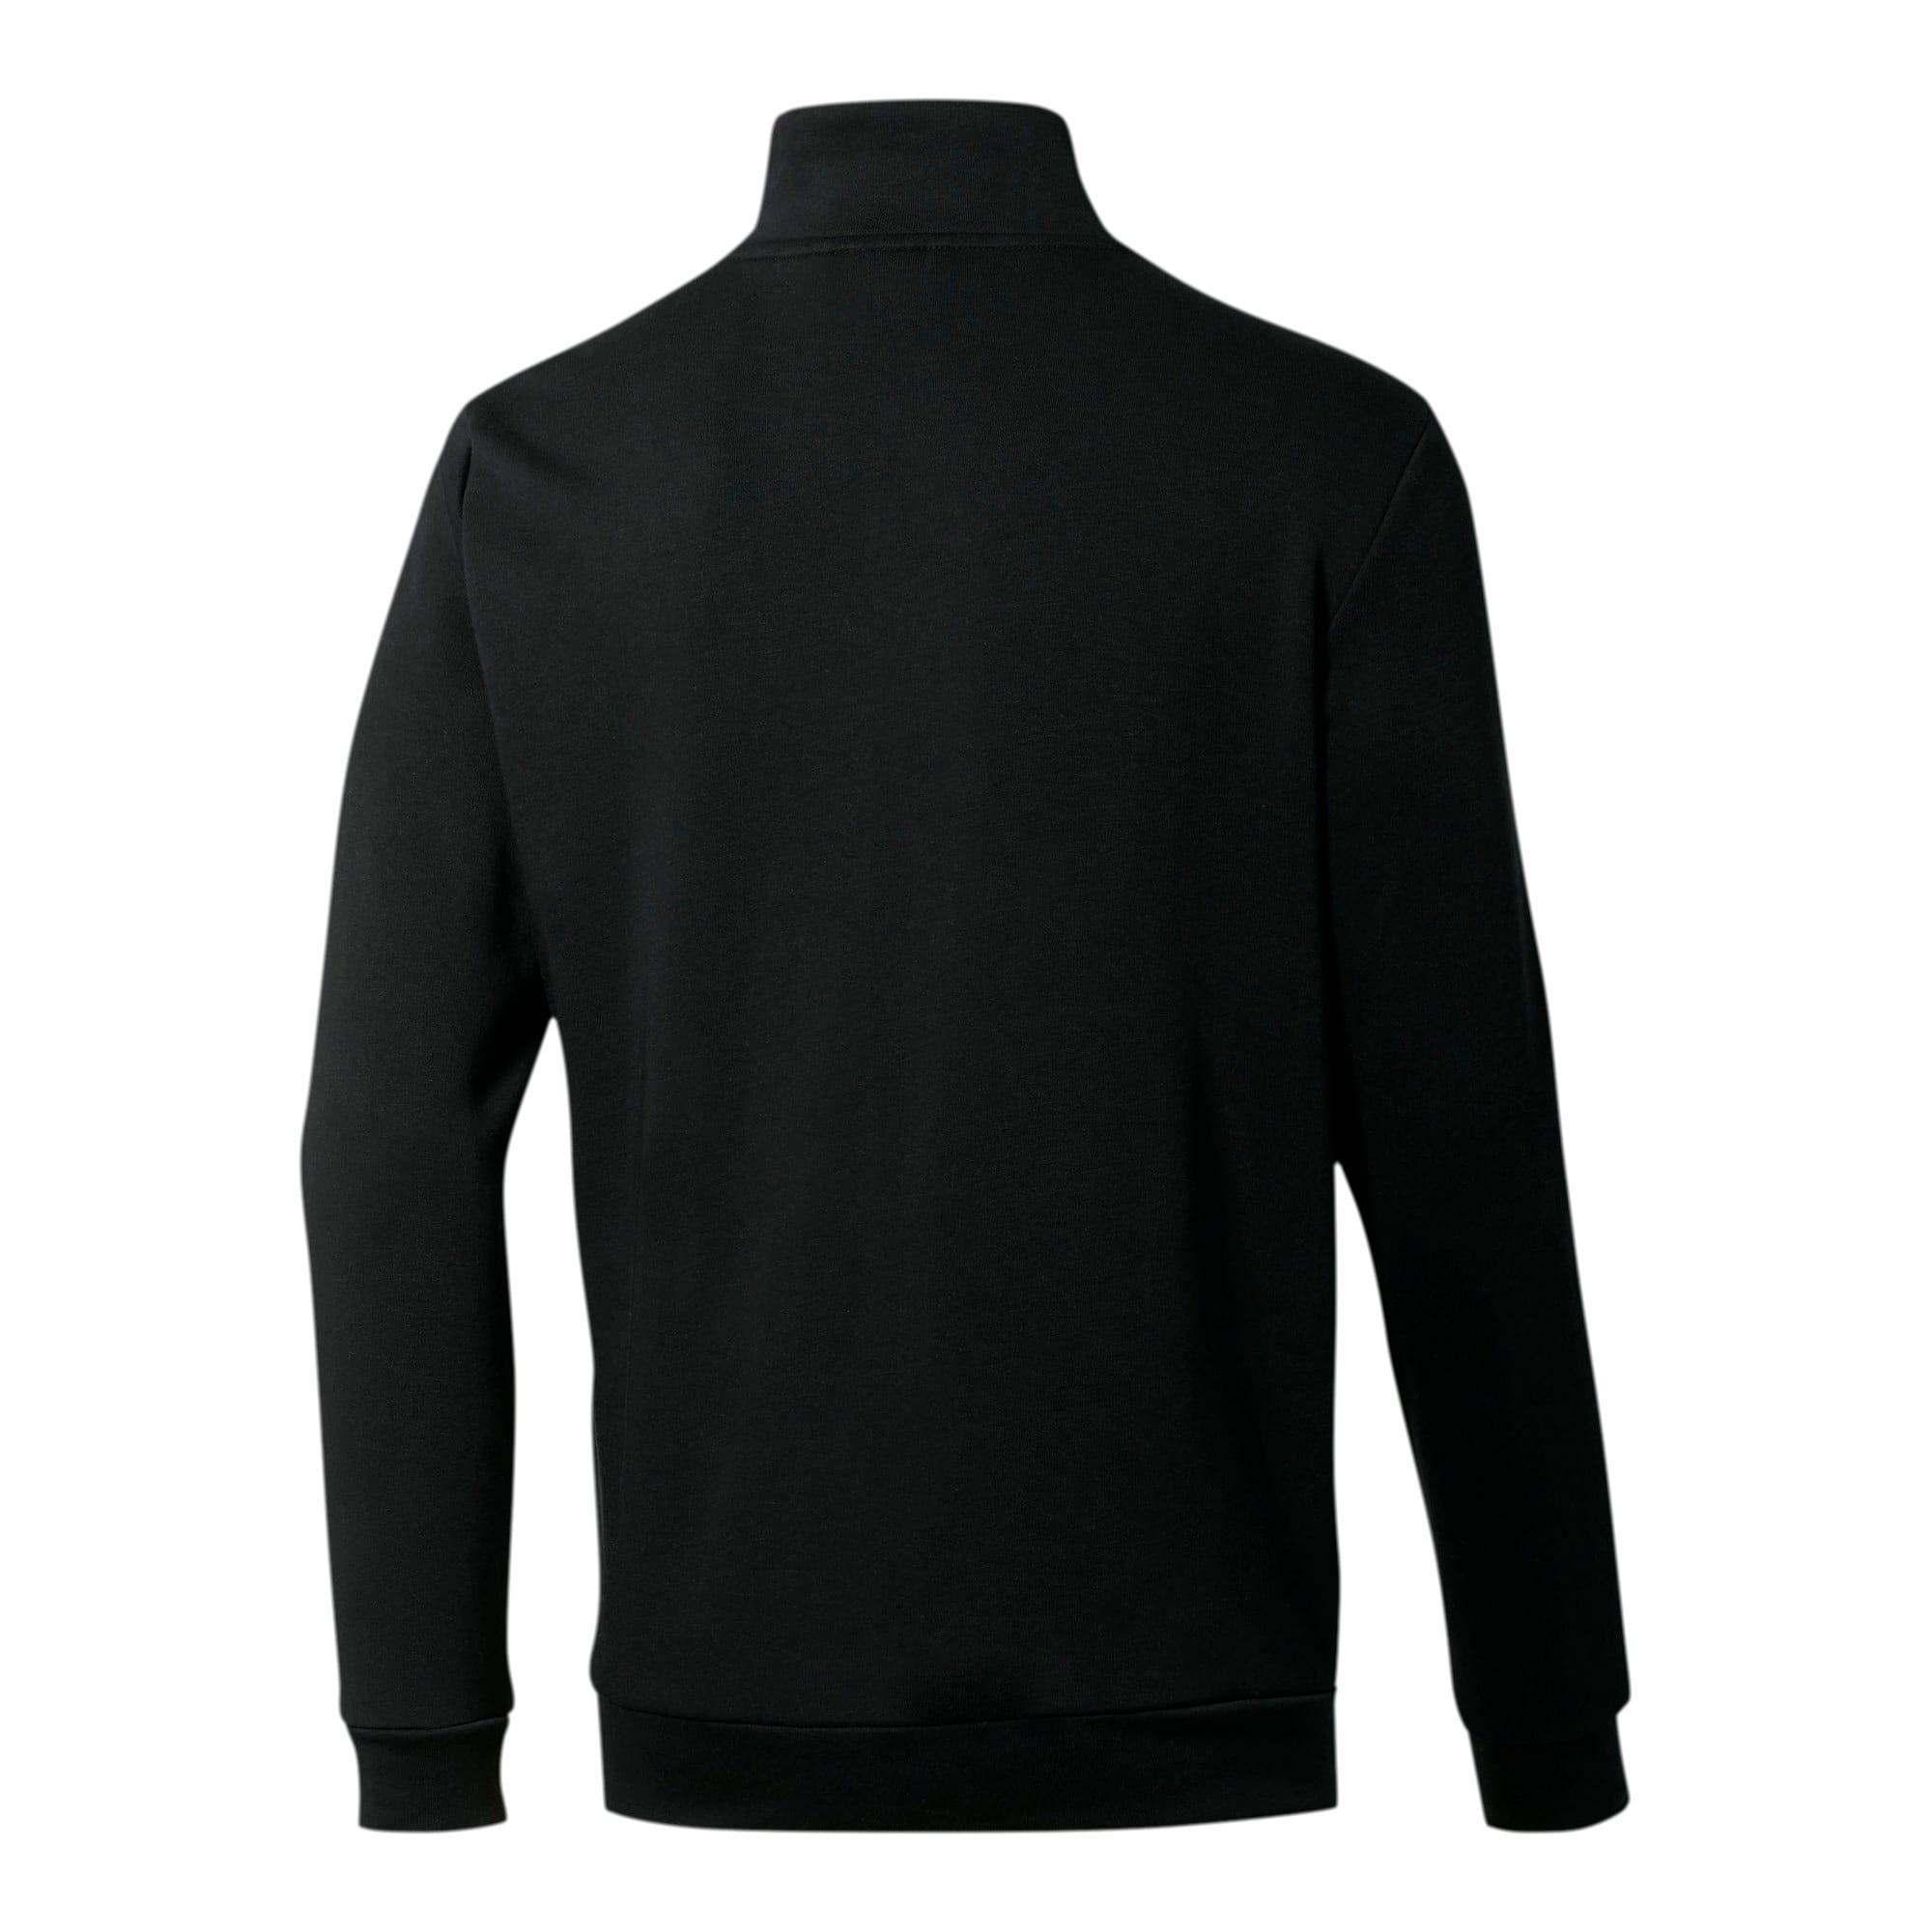 Miniatura 2 de Chaqueta deportiva PUMA x CLOUD9 High Score para hombre, Cotton Black, mediano